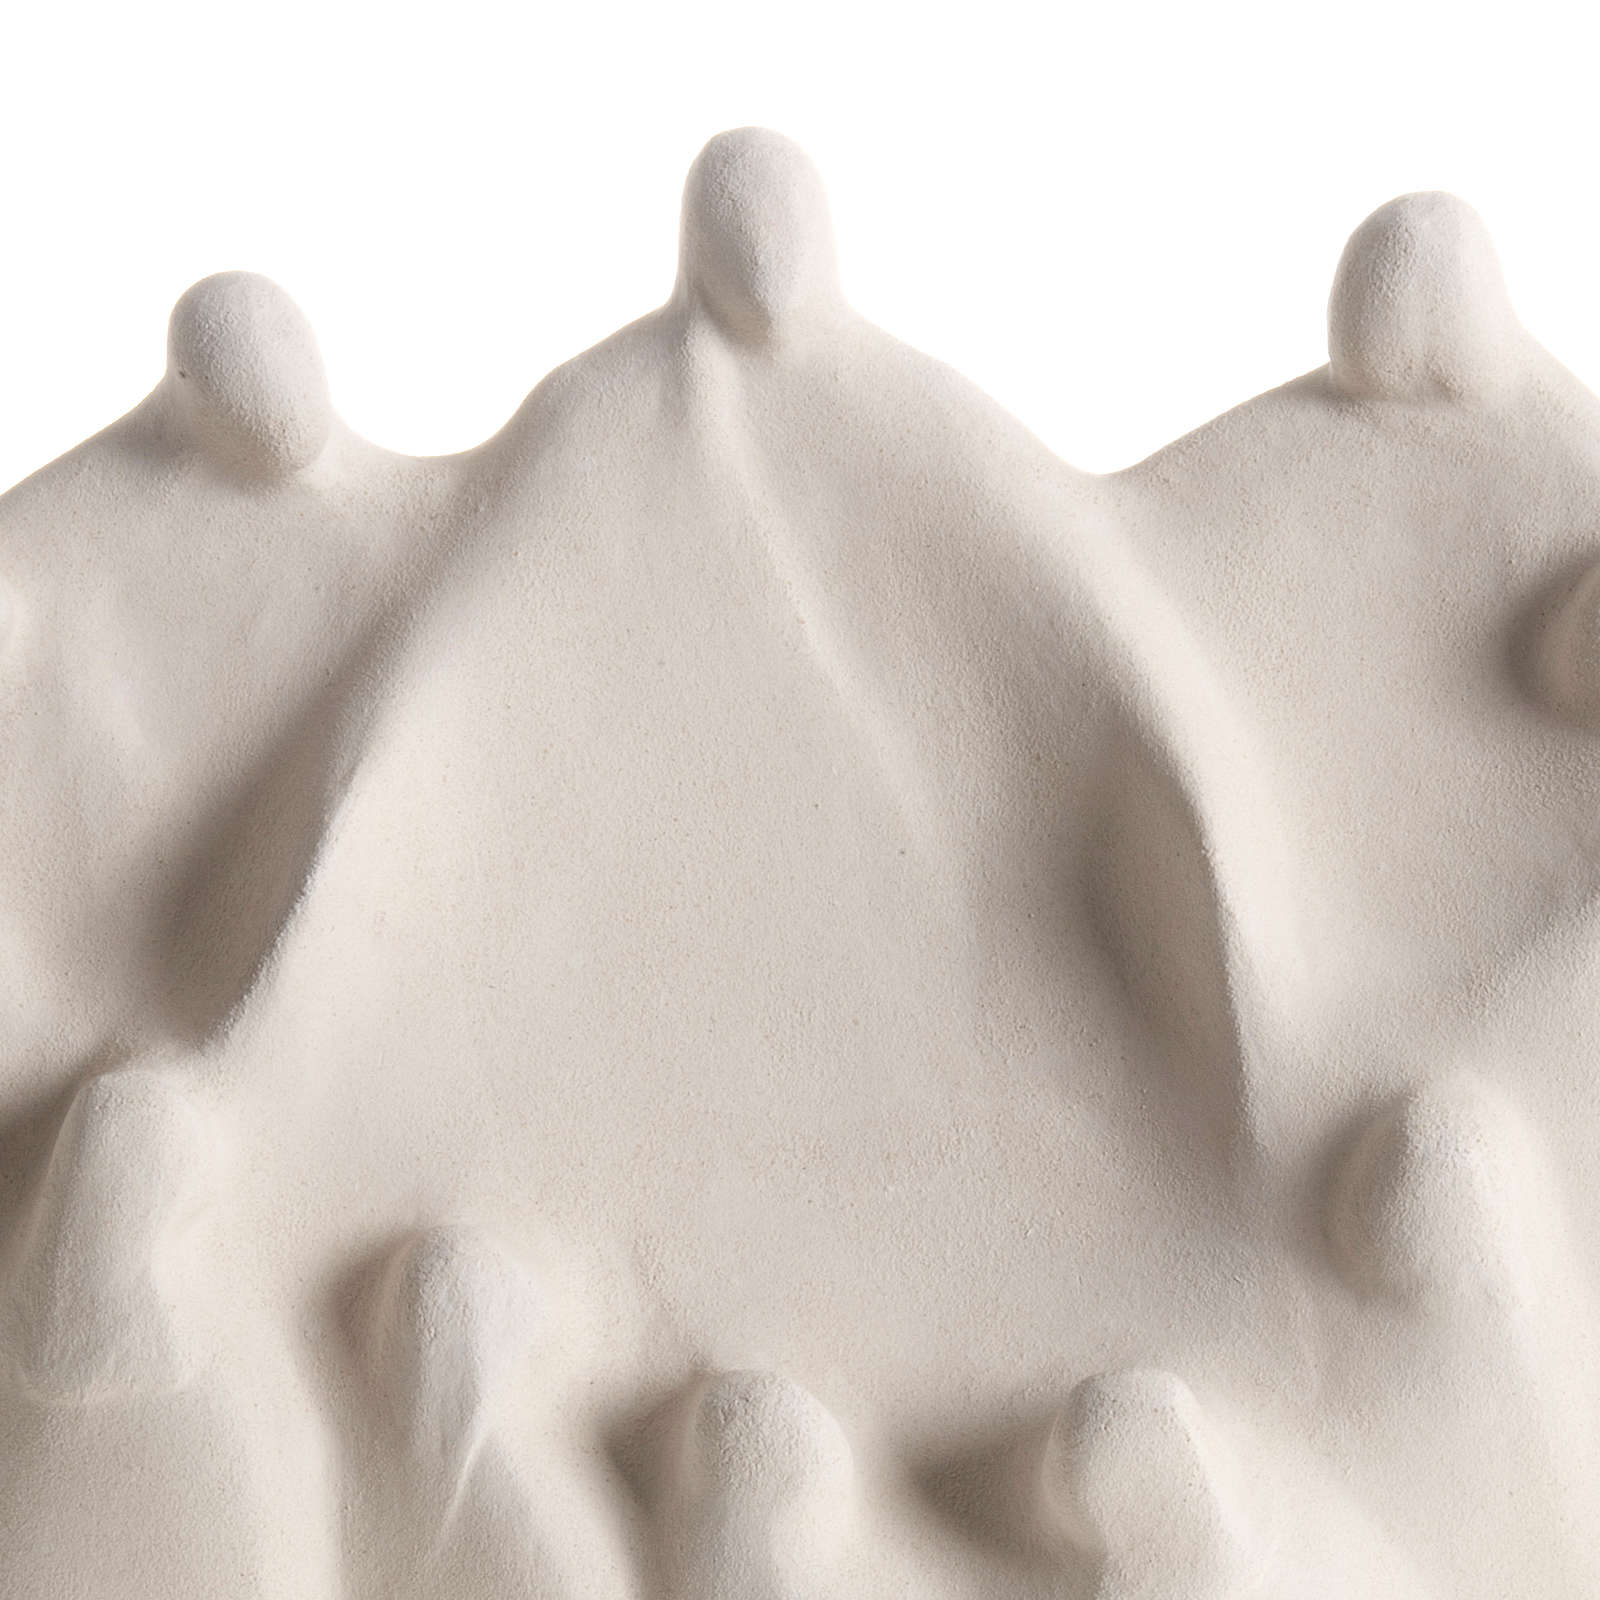 Bassorilievo Ultima Cena stilizzata argilla bianca 4